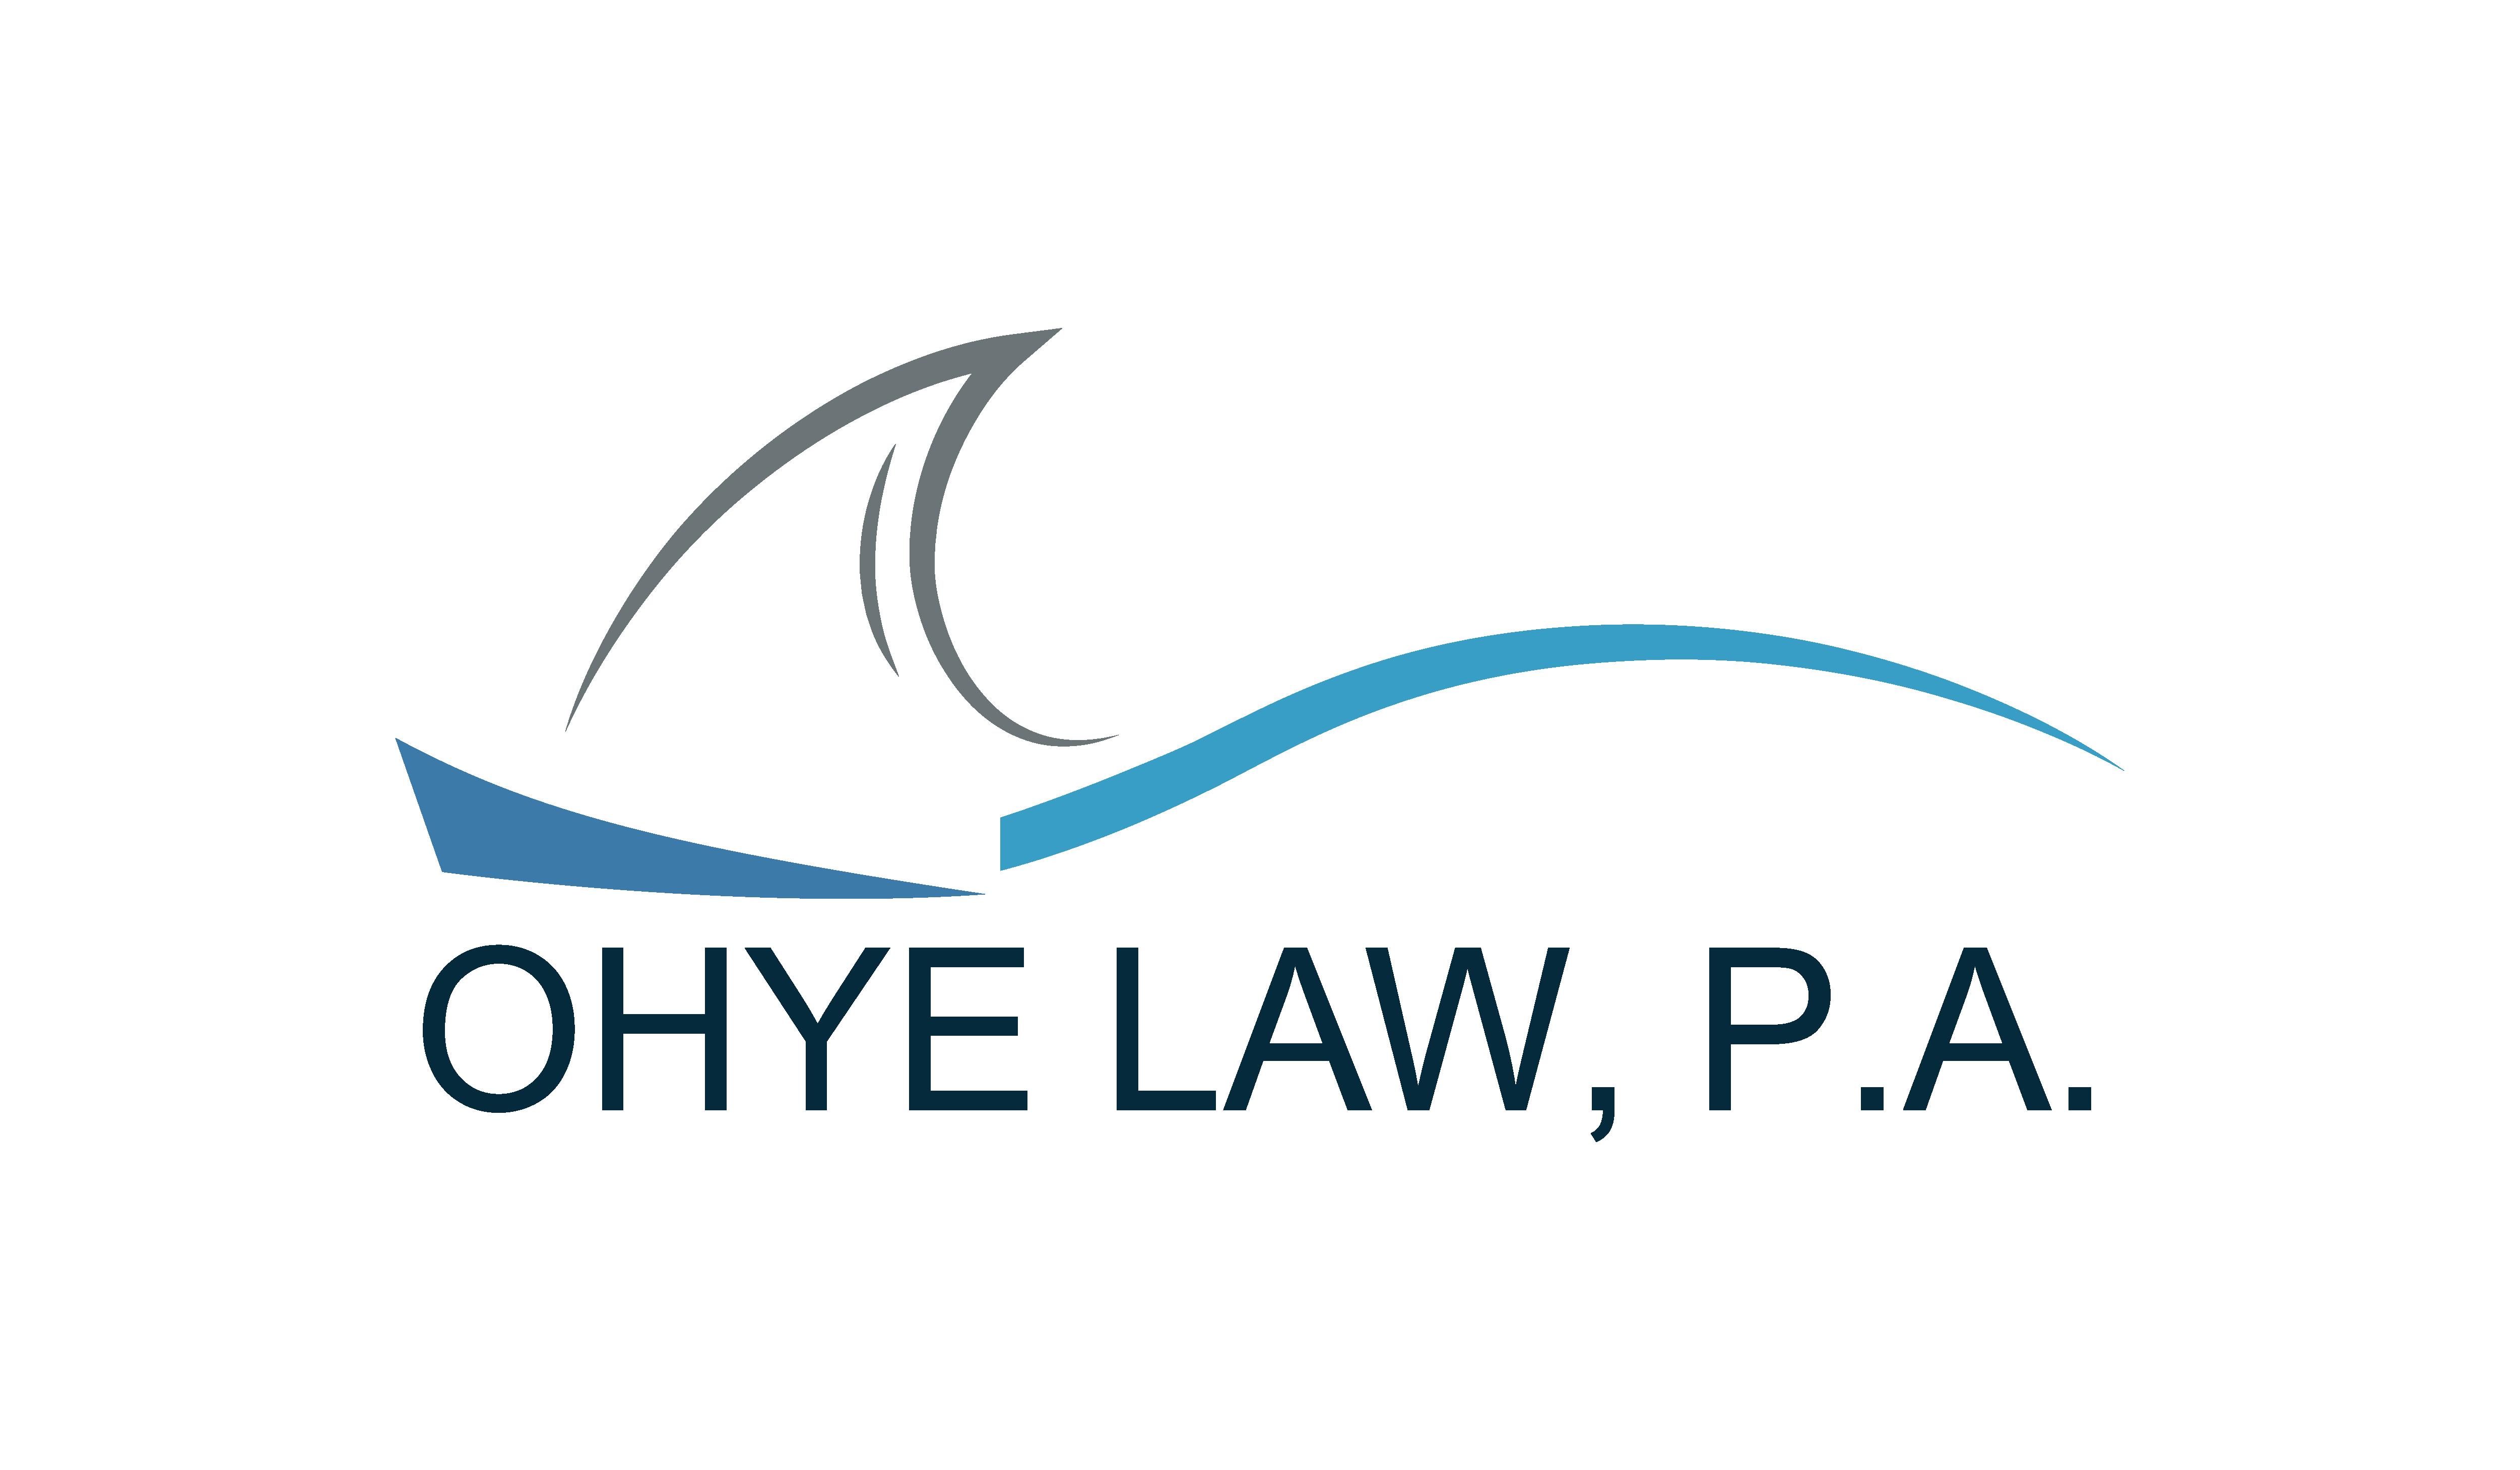 ohye law website development client